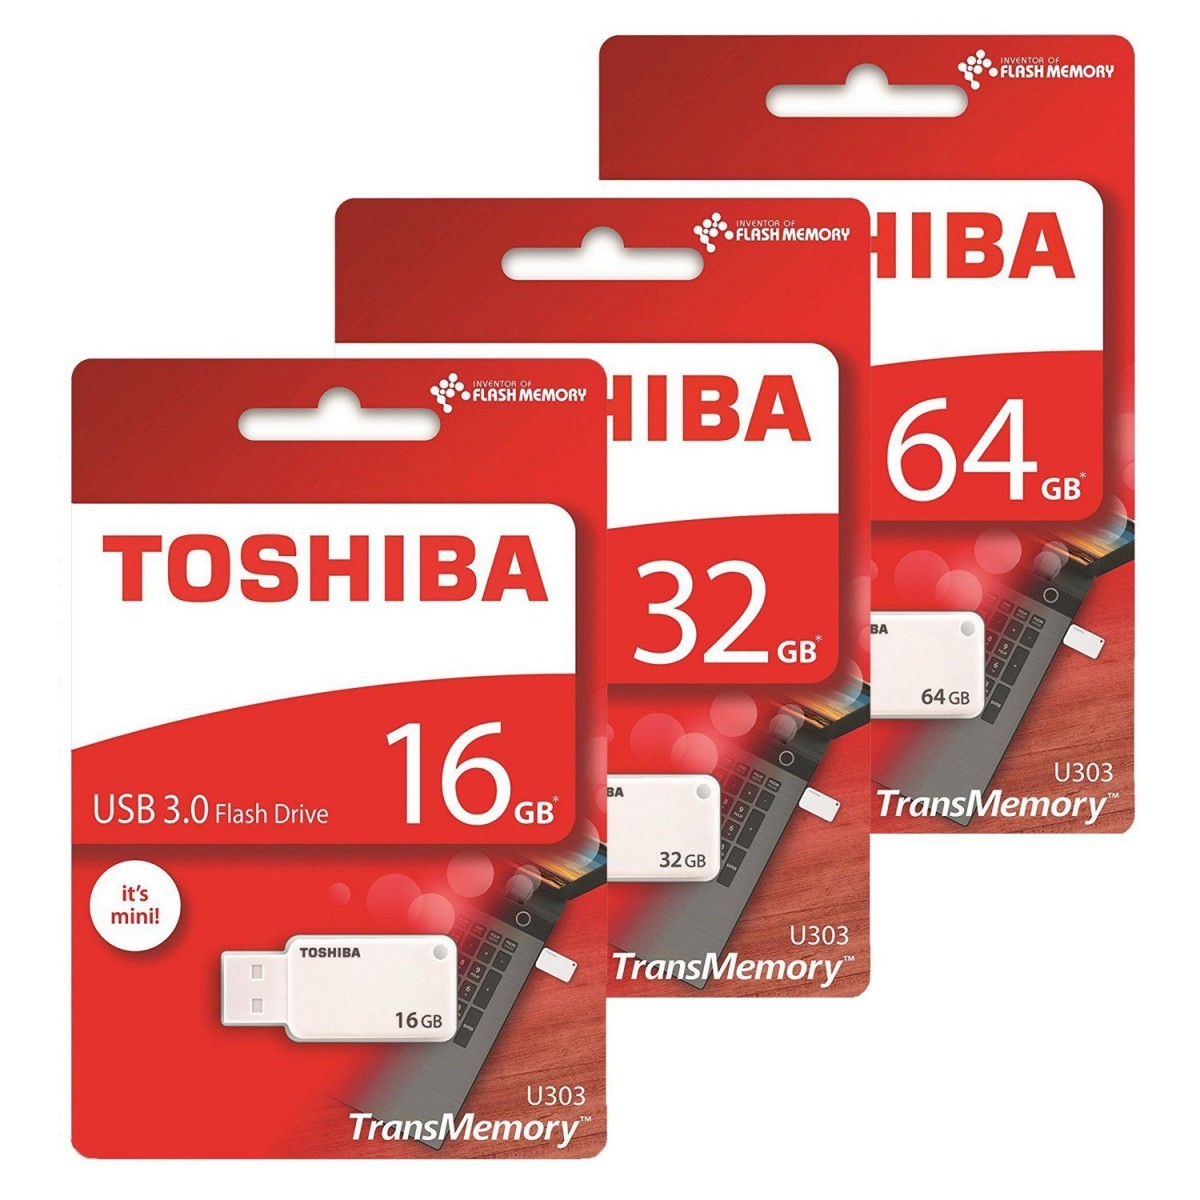 TOSHIBA U303 USB 3.0 Flash Disk (64GB/32GB/16GB)